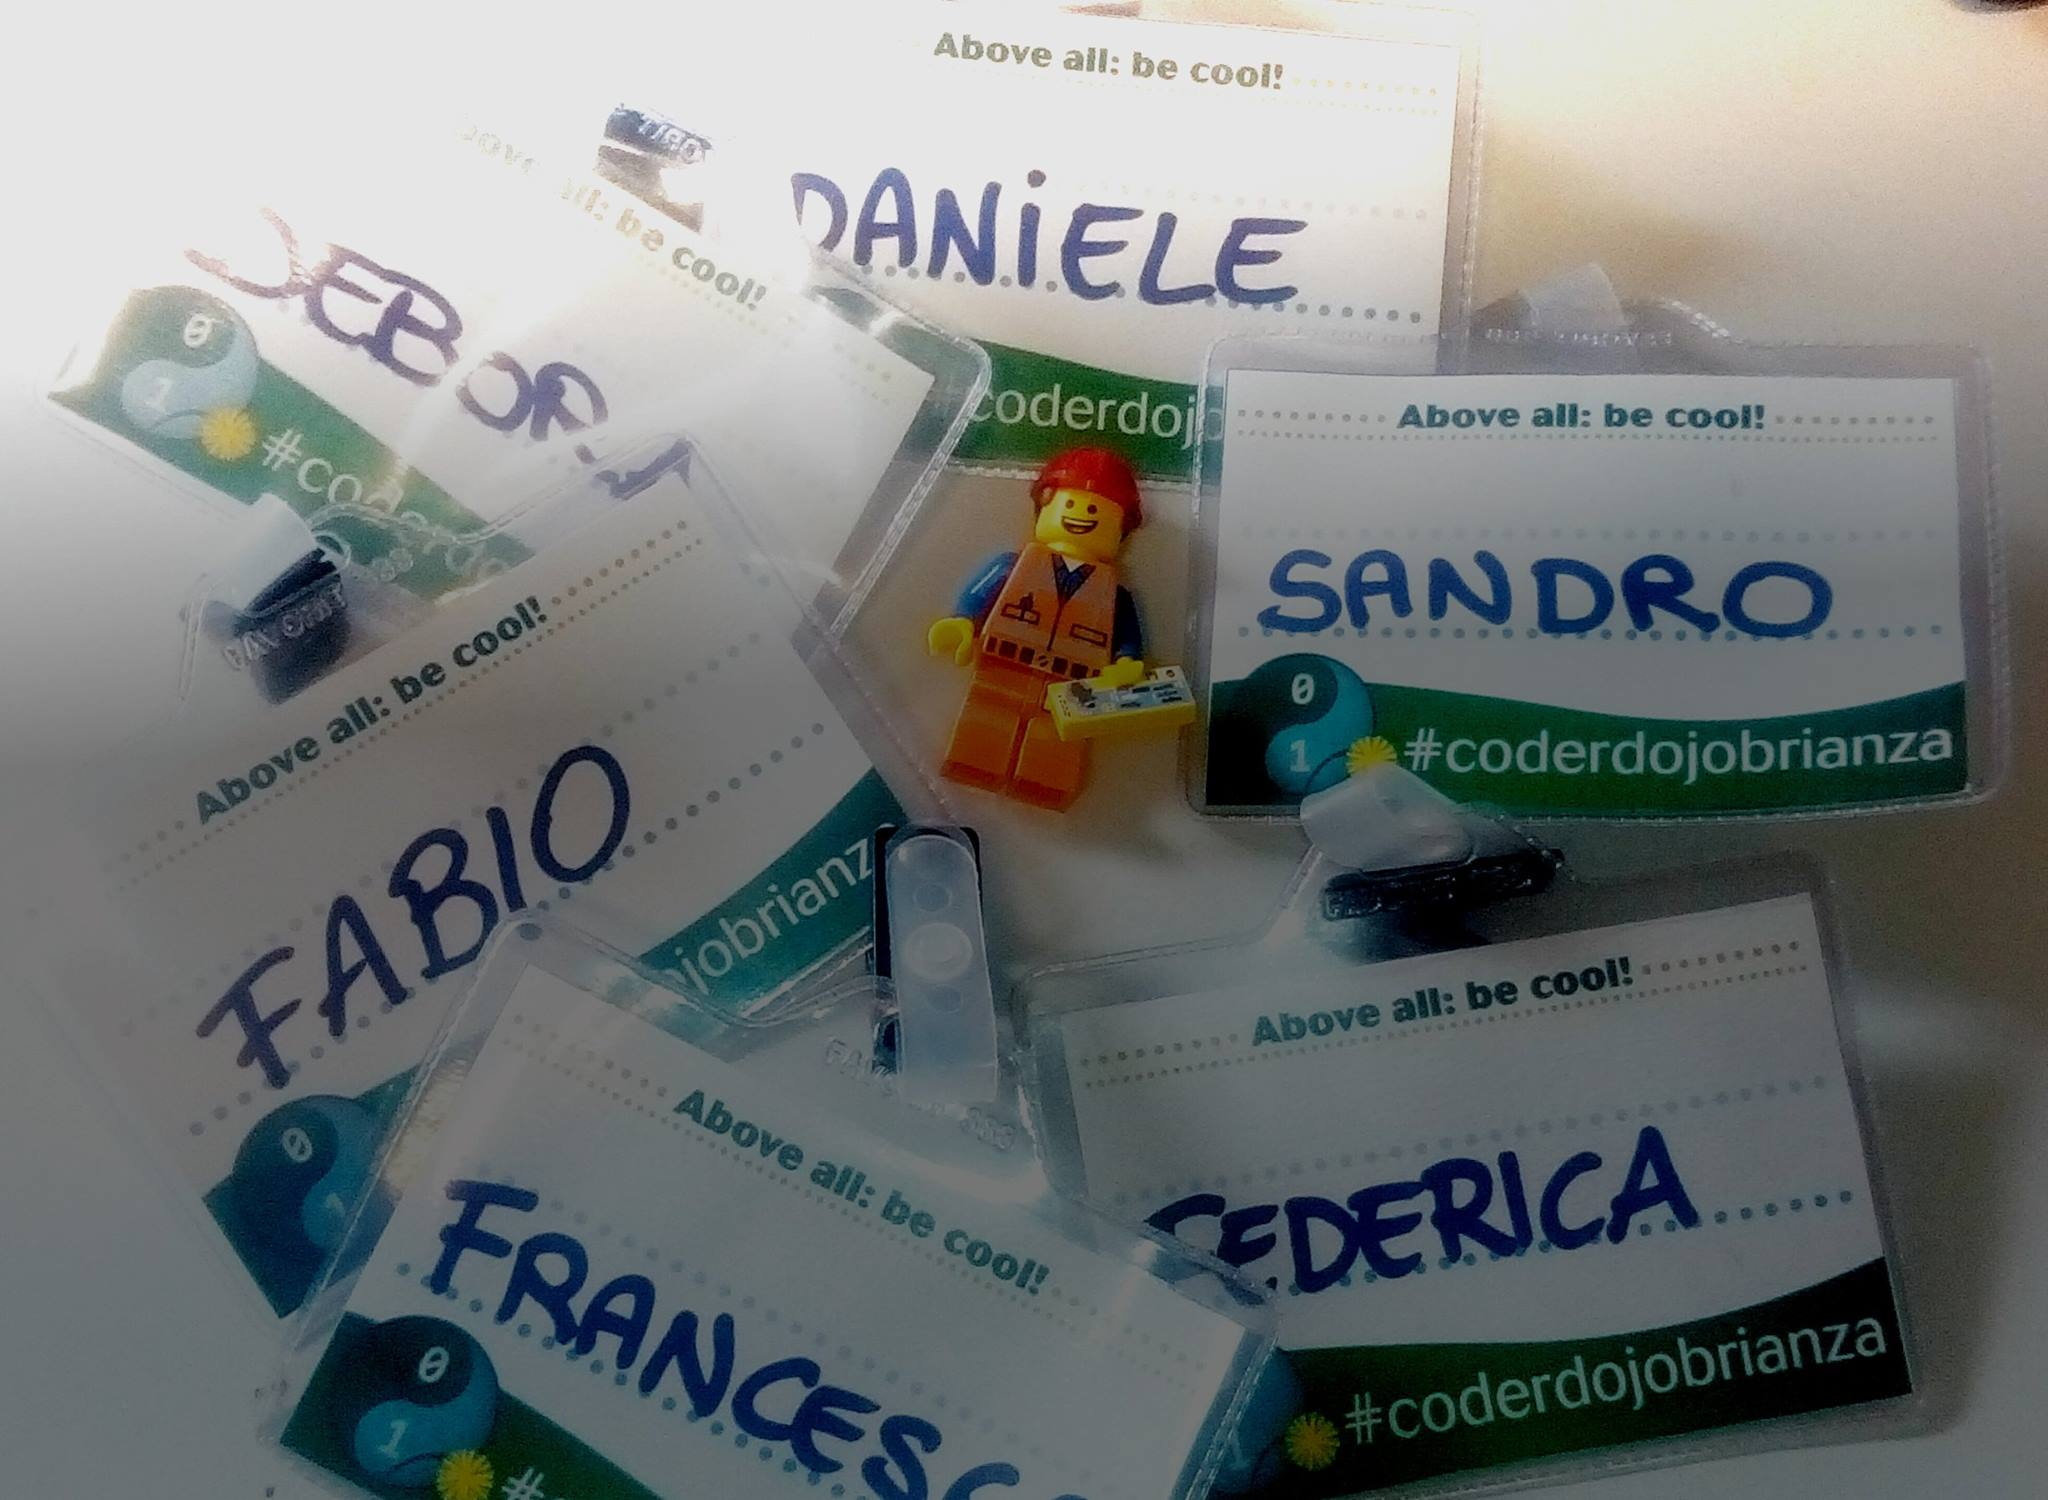 coderdojobrianza-20141122-mezzago